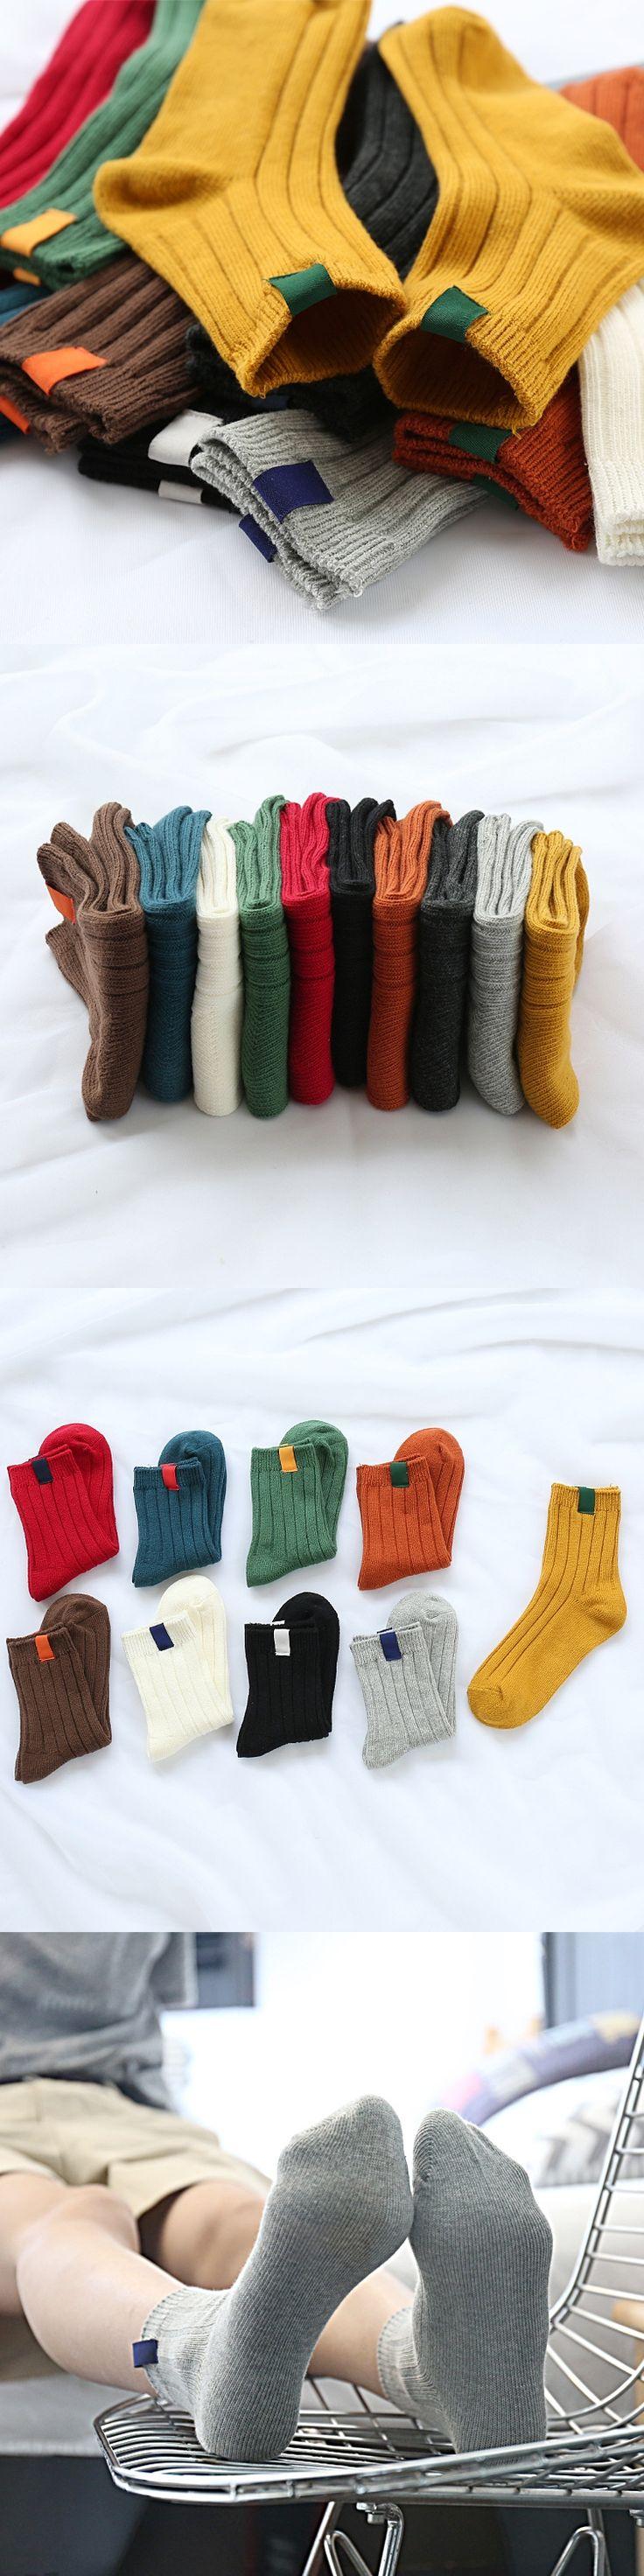 Unisex Kids Big Boys Girls School Popular Socks 5 Pairs 100% Cotton Solid Warm chaussette enfant